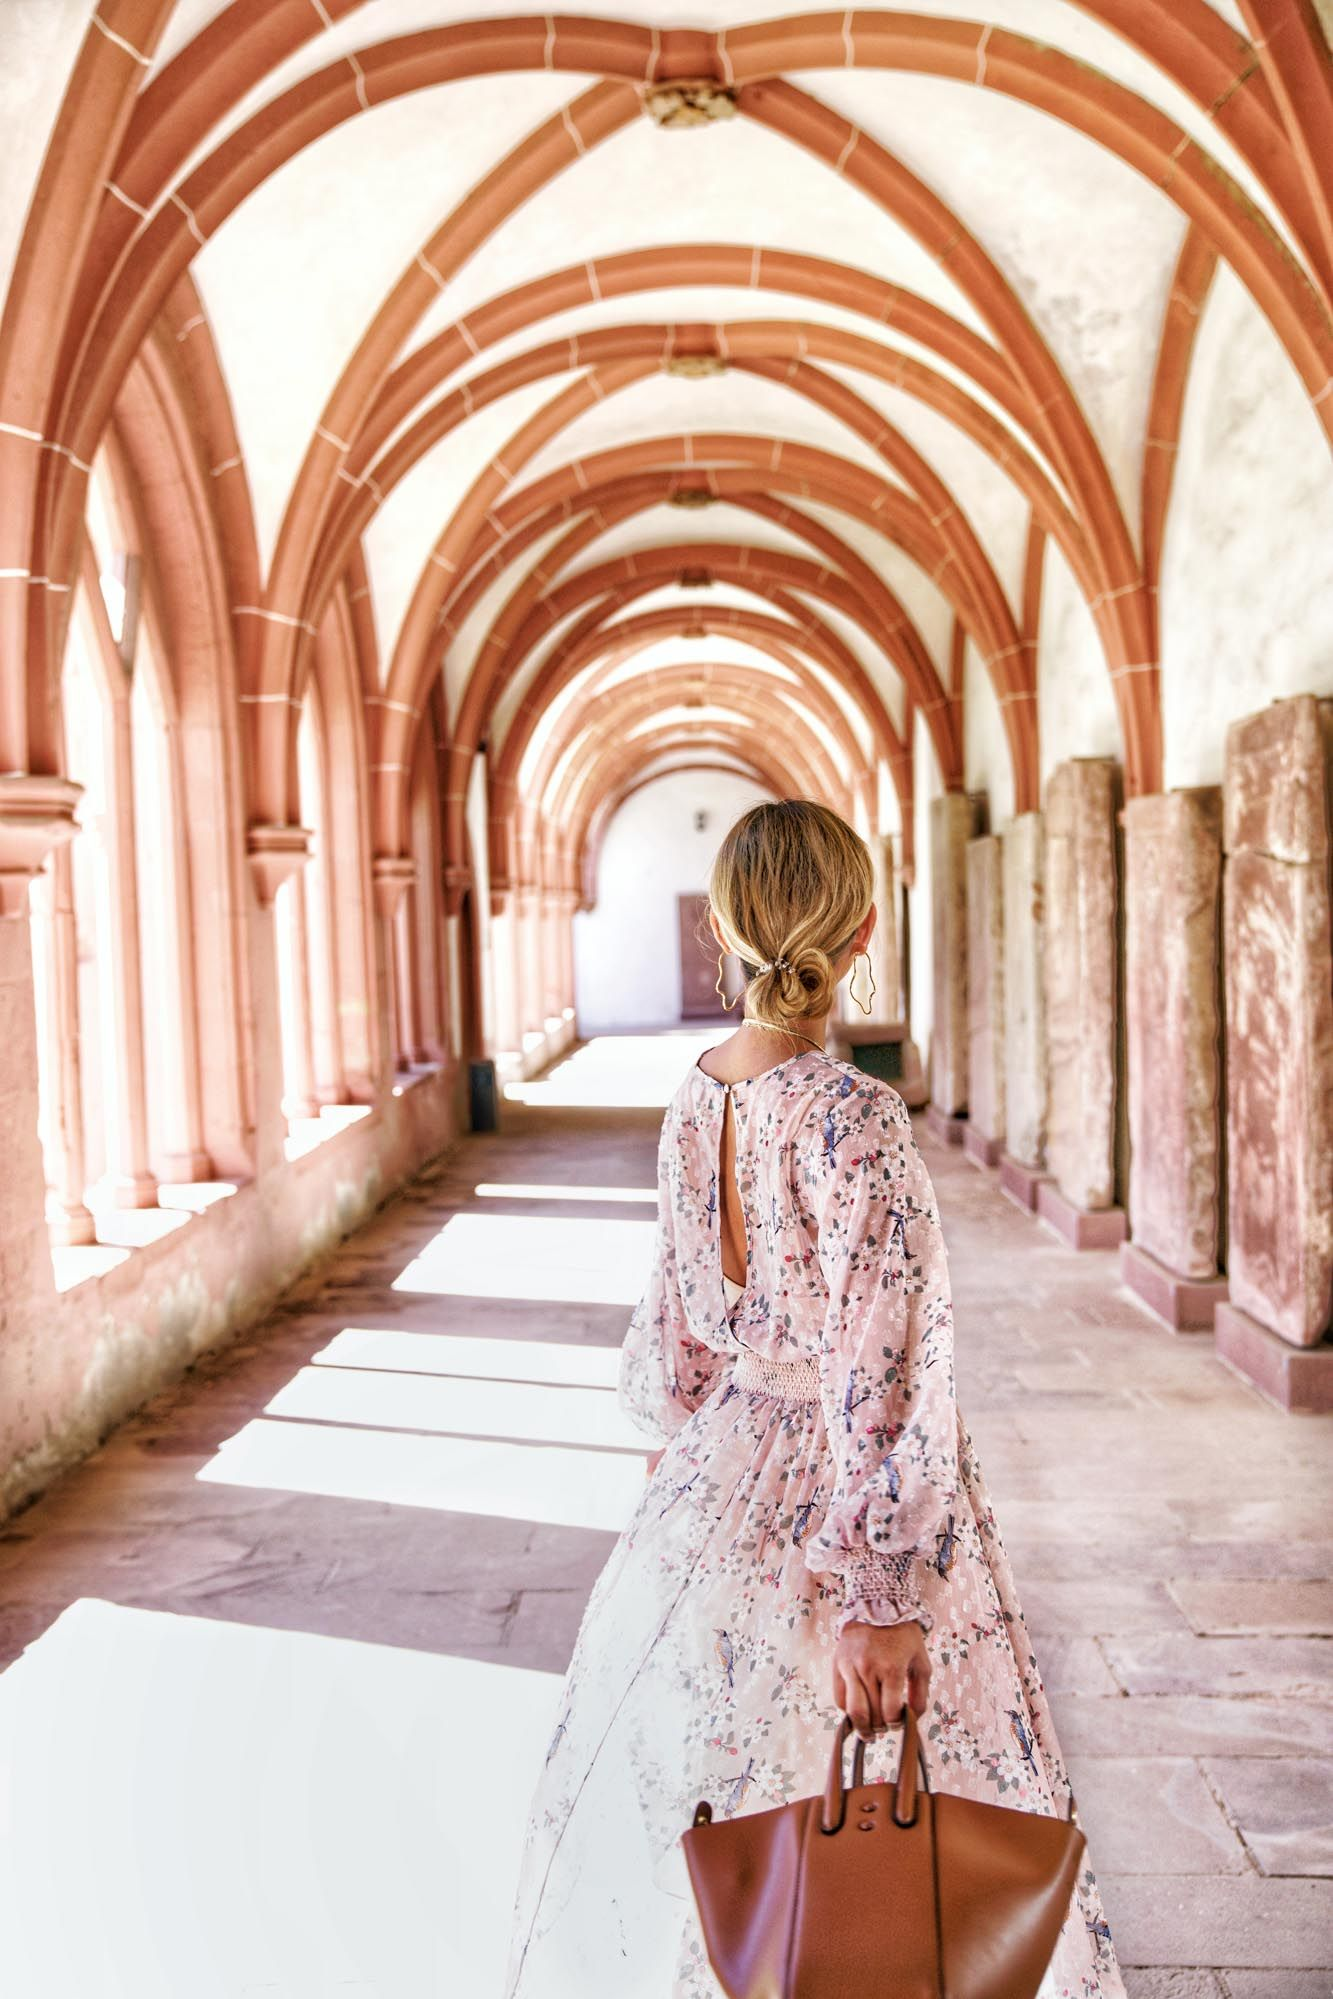 Eberbach Monastery, Abbey Wine - Germany, Rudesheim, U by Uniworld